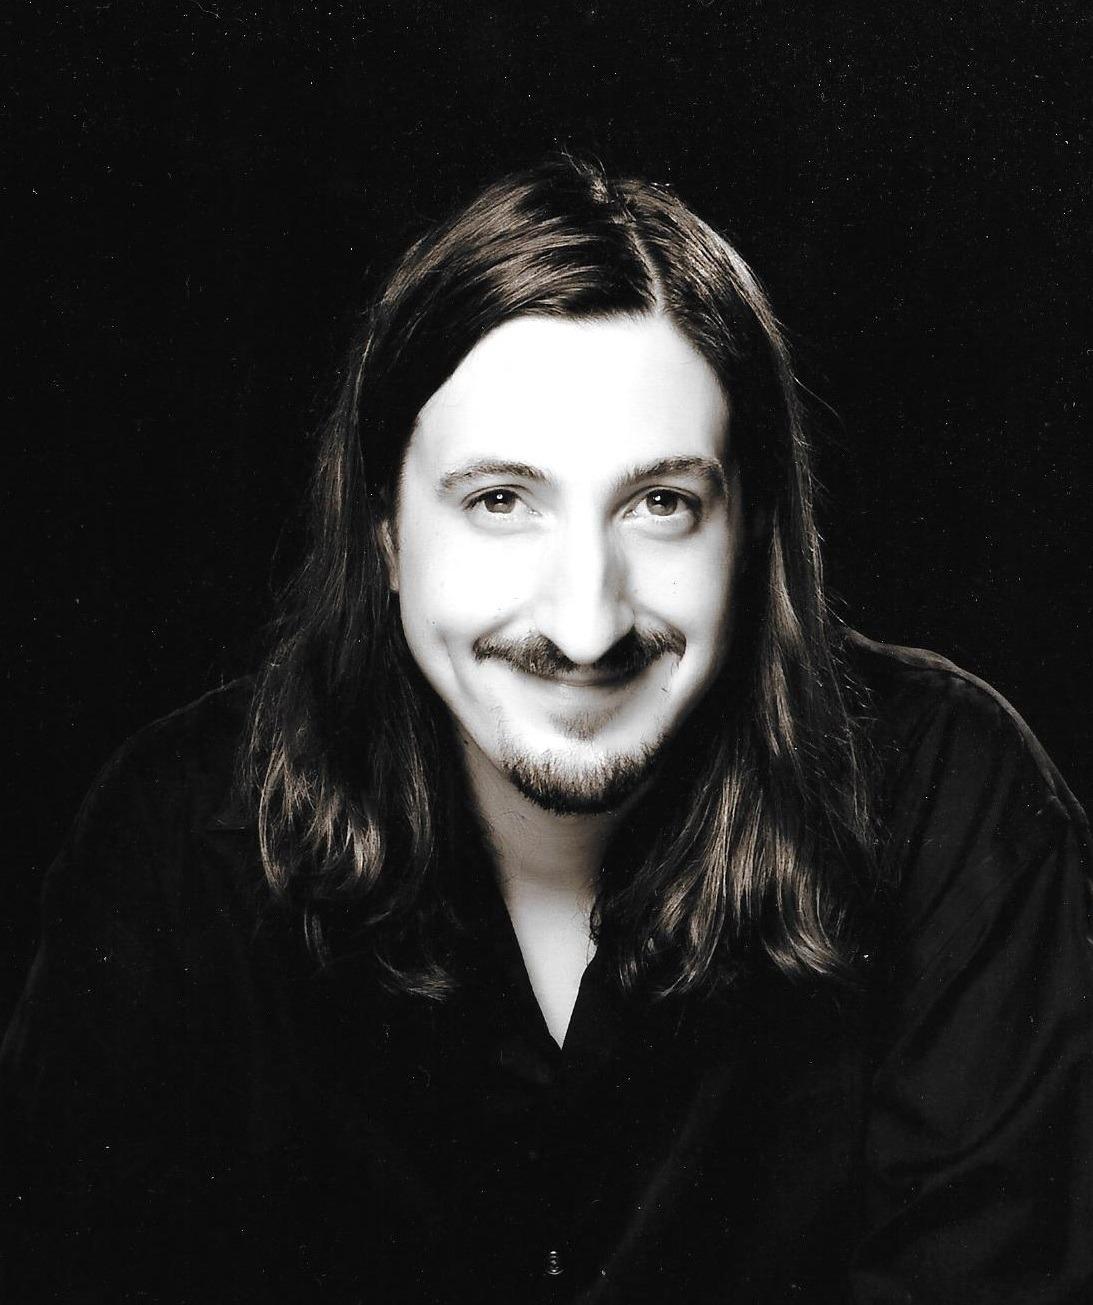 James Yagielo